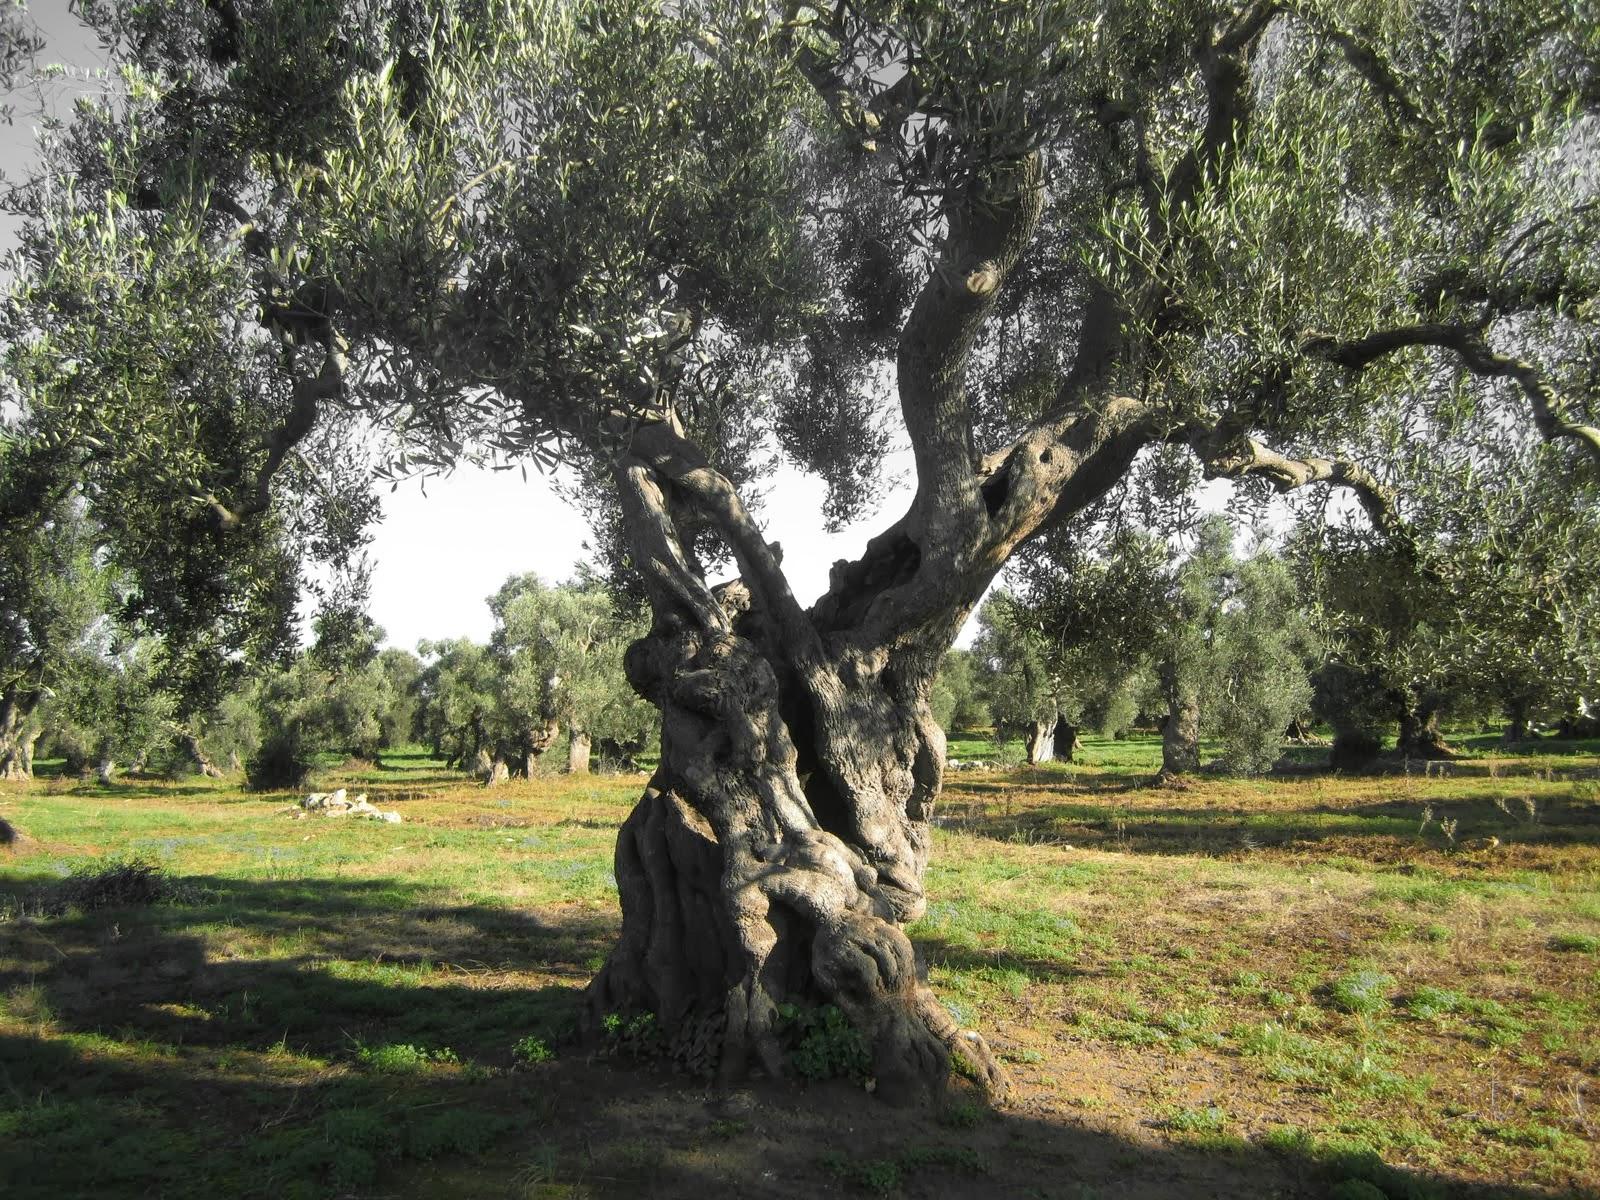 Athenas olive tree symbol